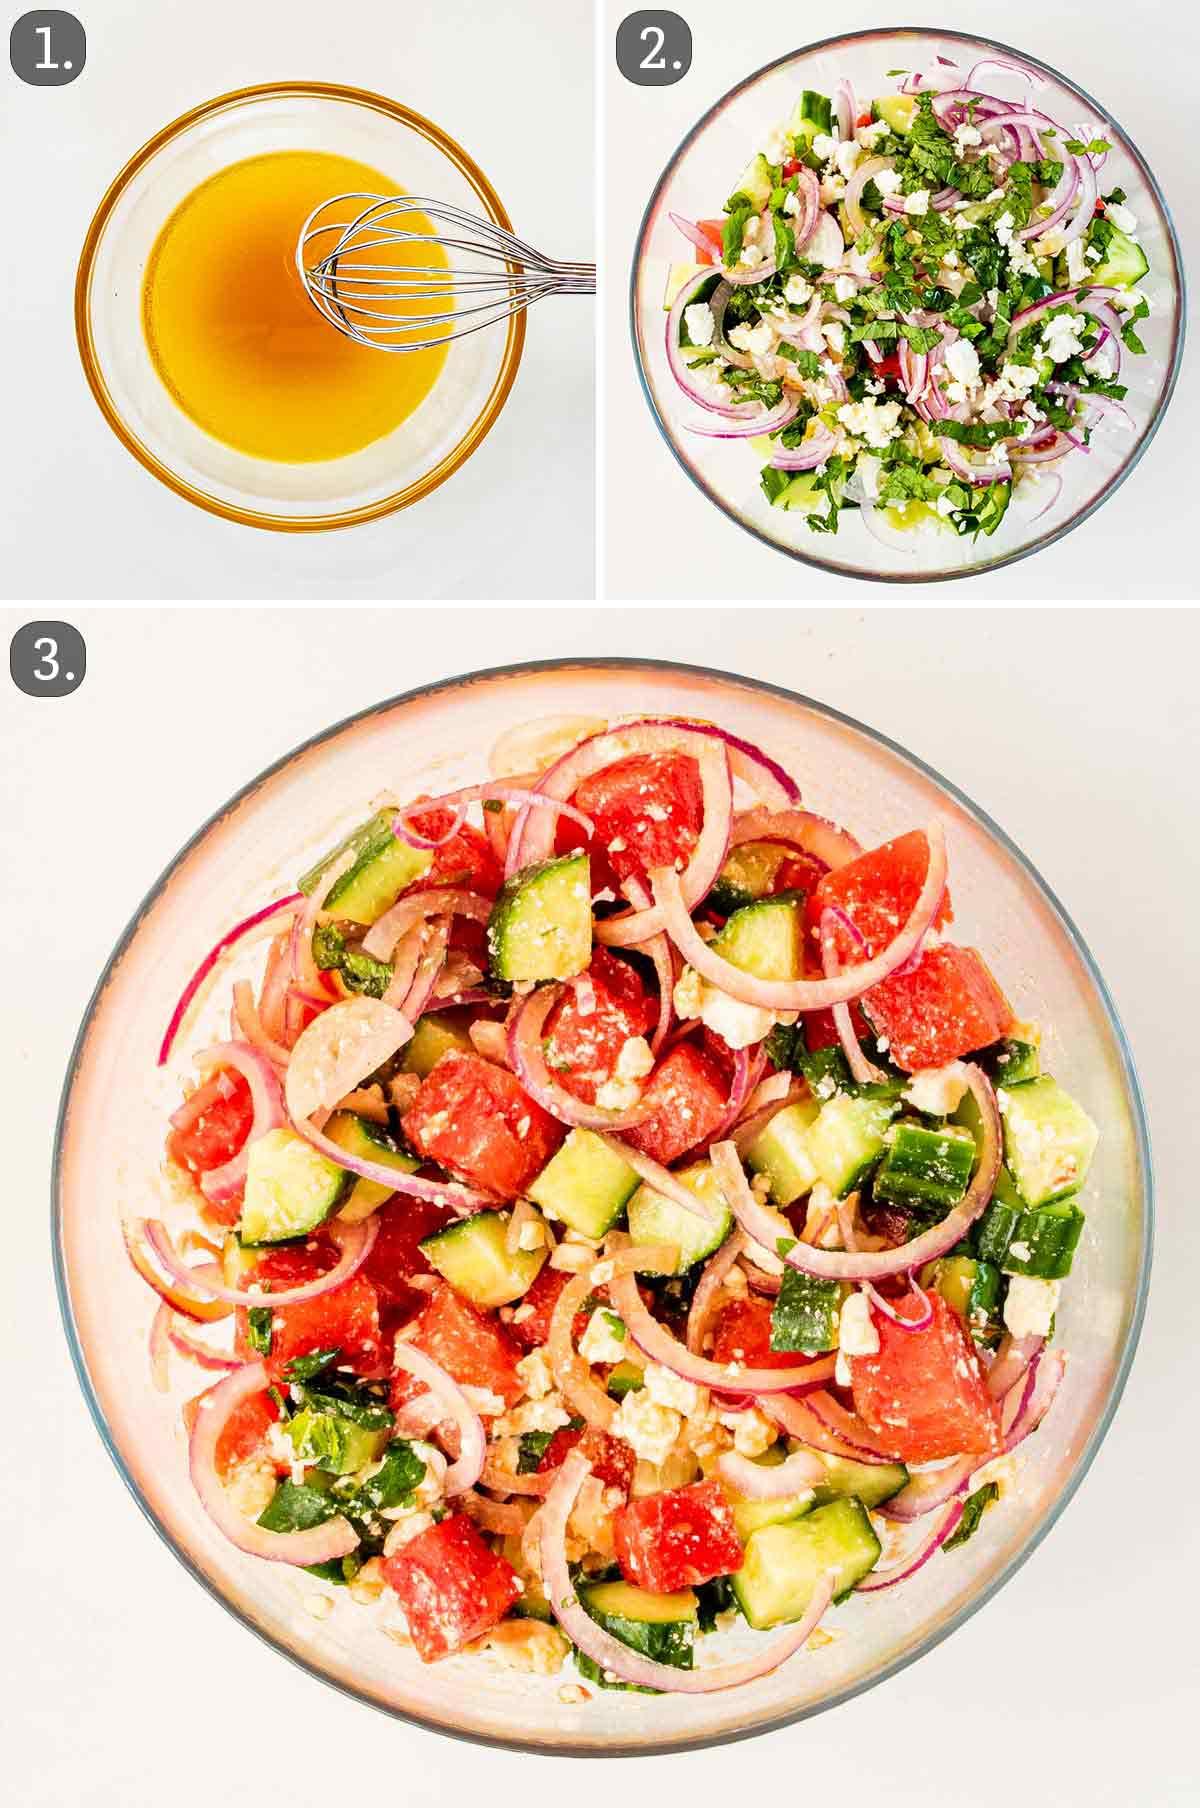 process shots showing how to make watermelon feta salad.